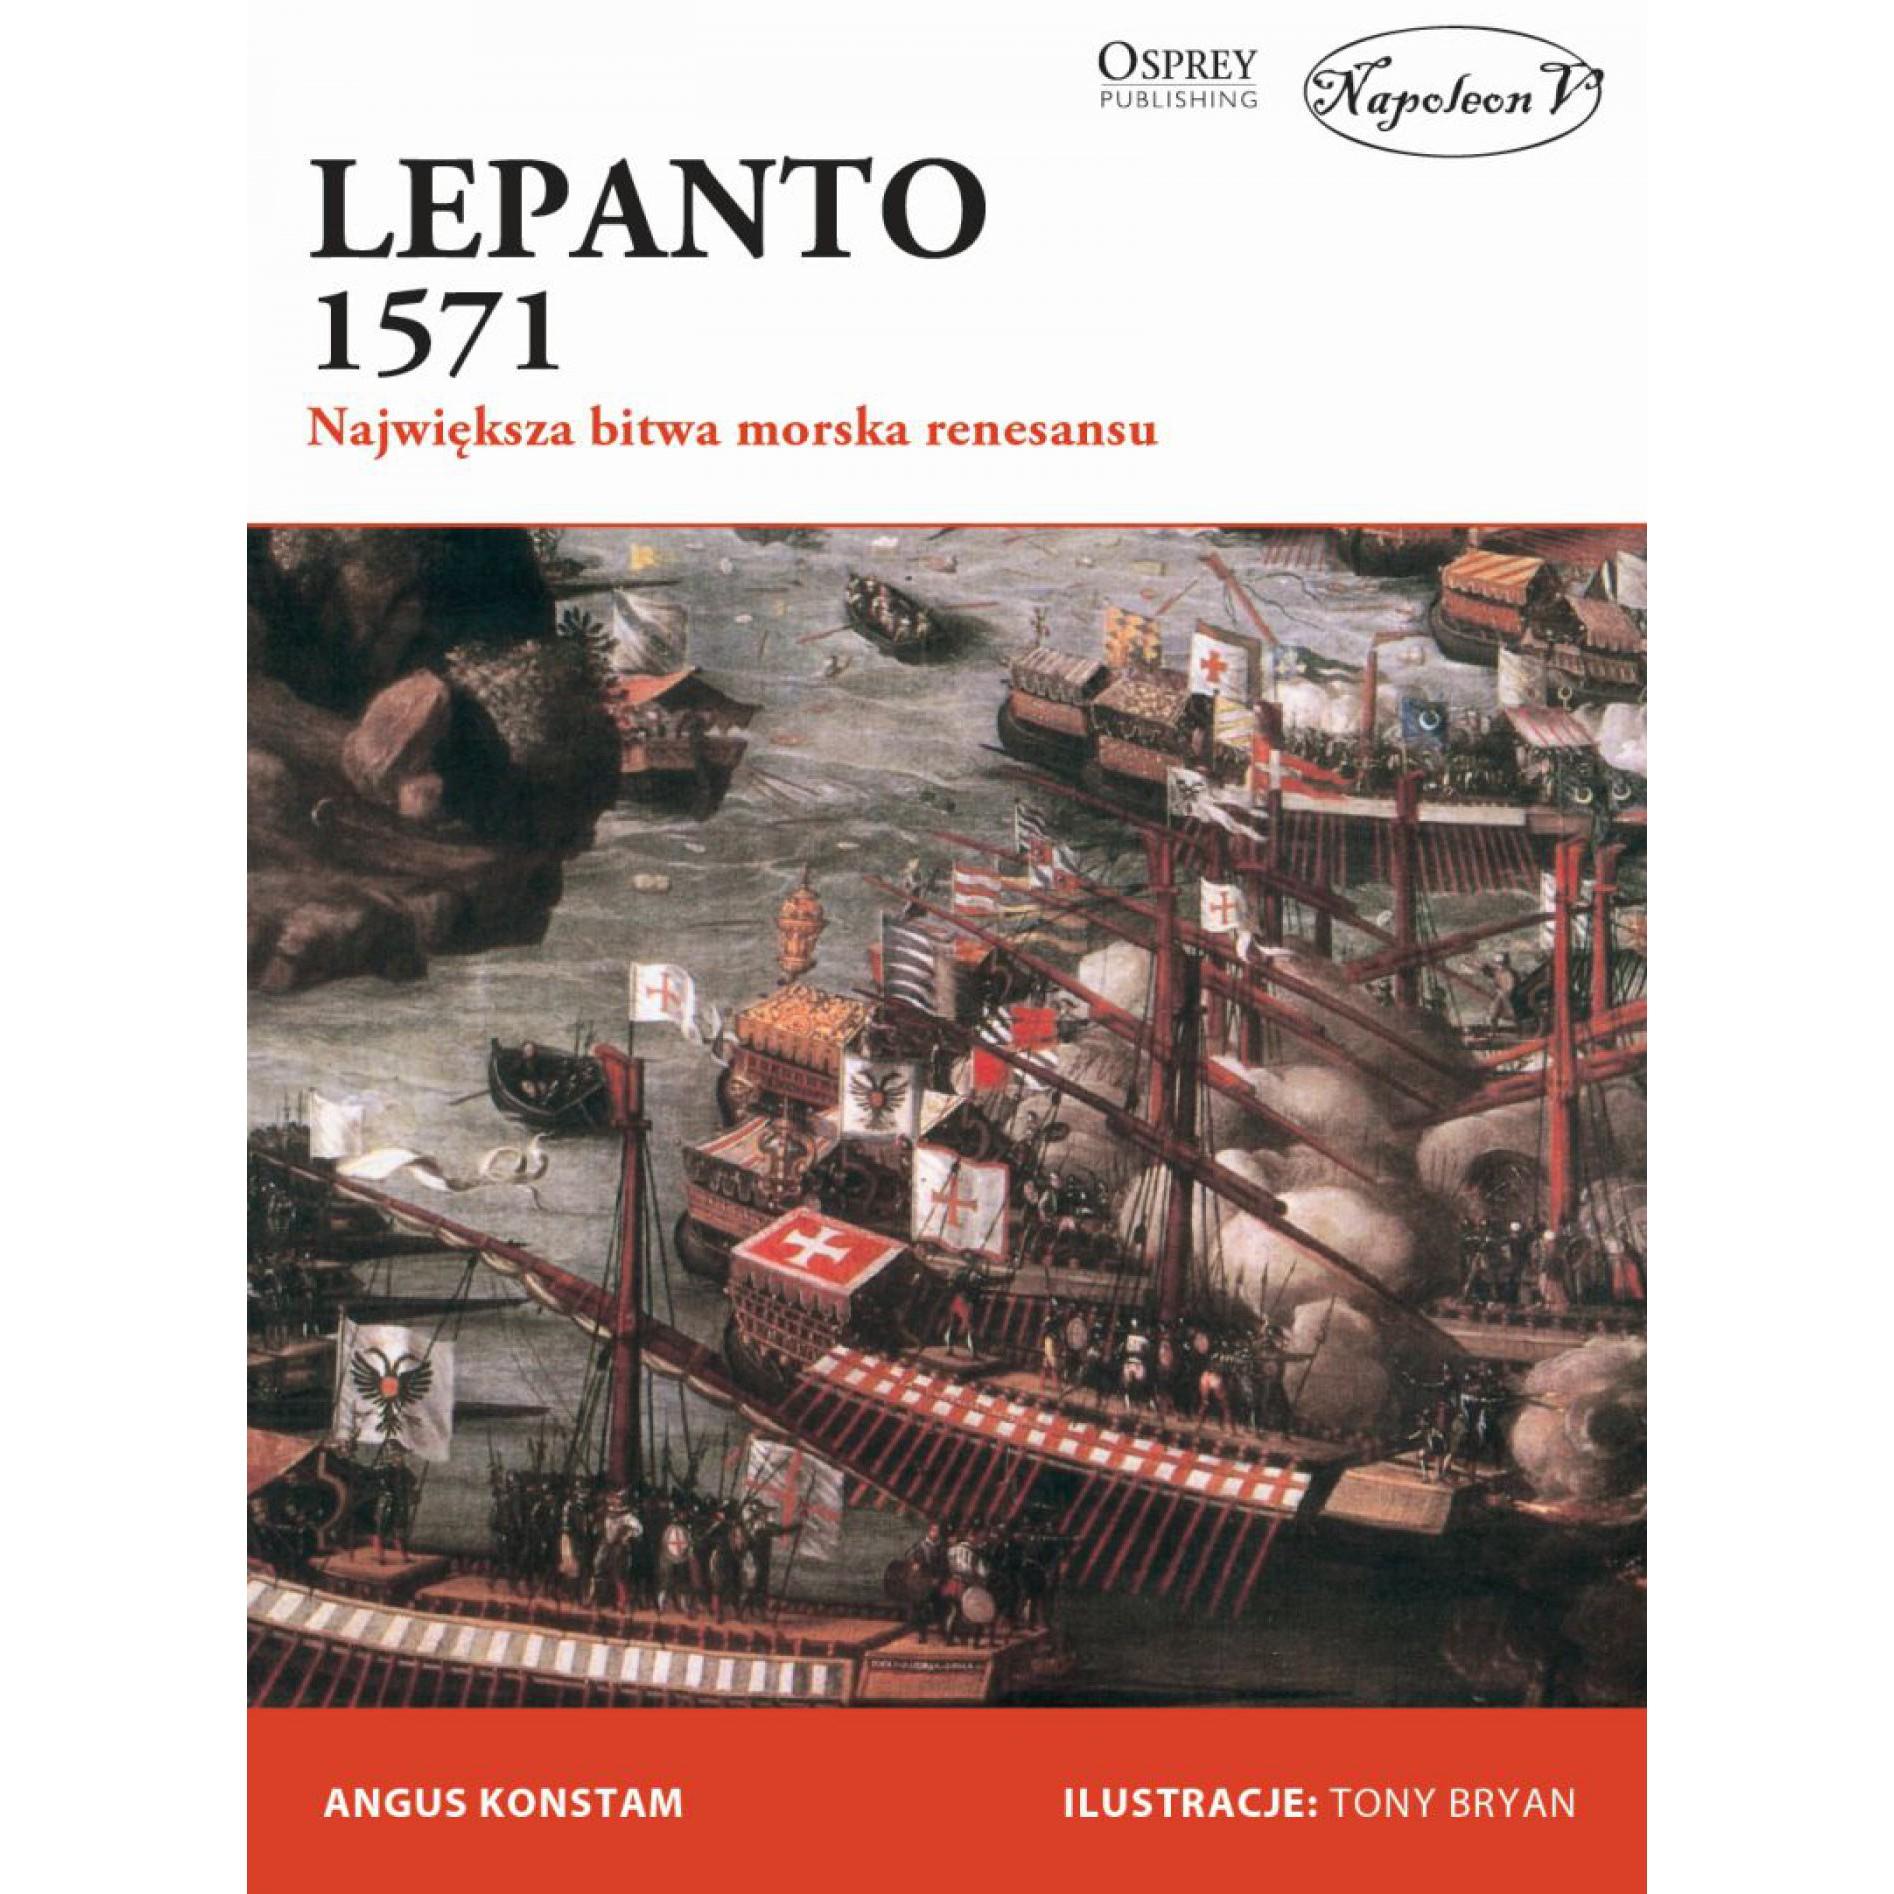 Lepanto 1571 Największa bitwa morska renesansu